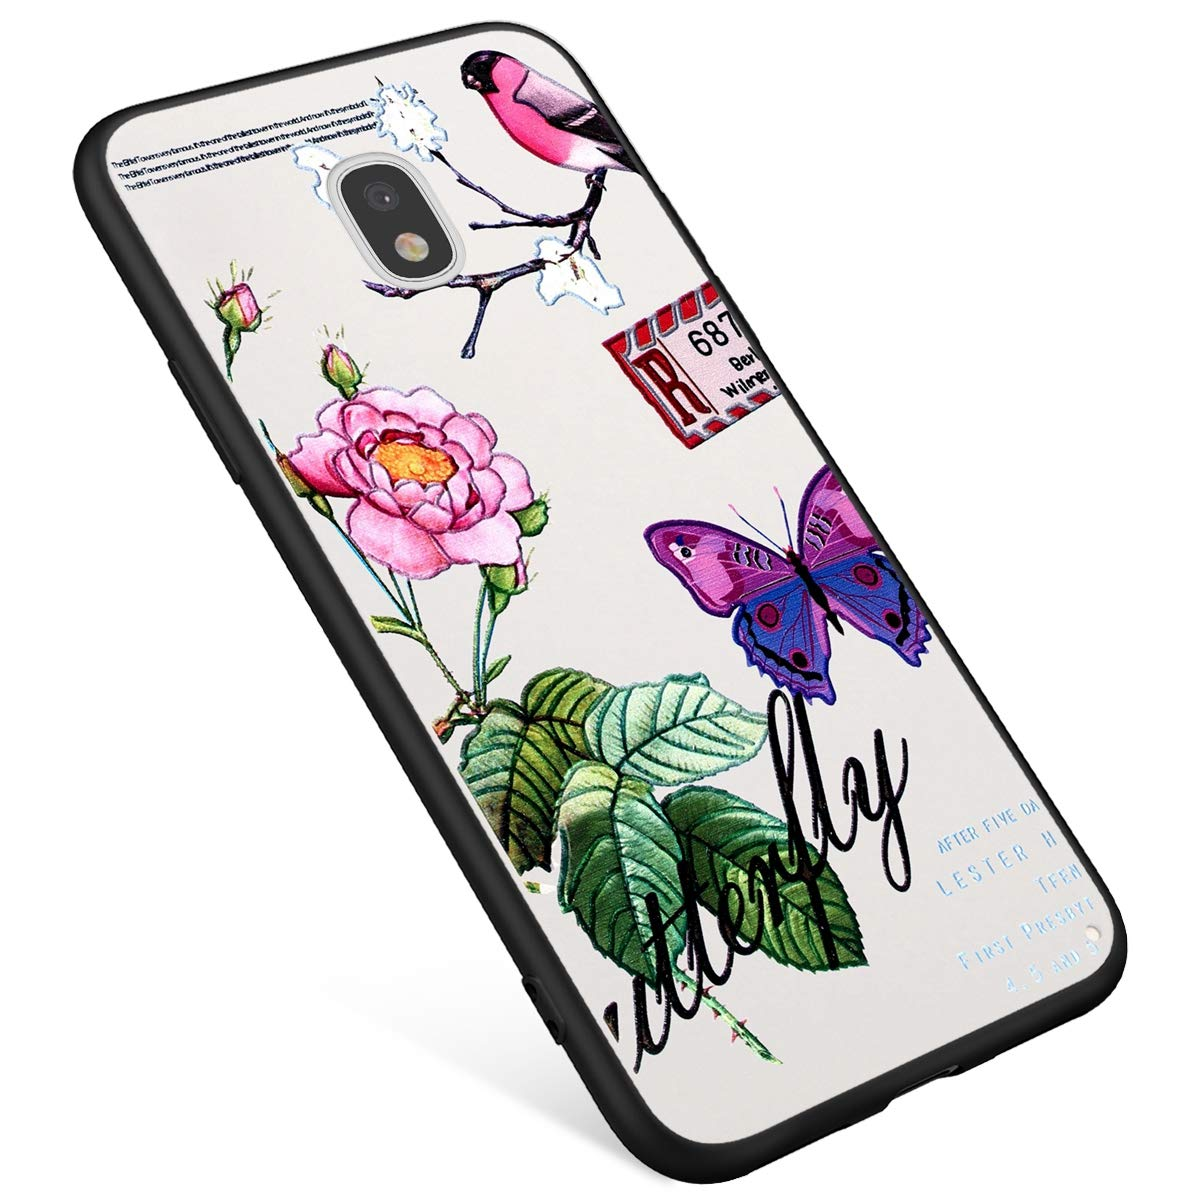 Coque Samsung Galaxy J3 2017,Galaxy J3 J330 Etui en Silicone avec Motif Fantaisie Peinture Fleur Flamingo Case pour Fille Ultra Mince Anti Choc Anti-Rayures Housse de Protection Swag Bumper Shell